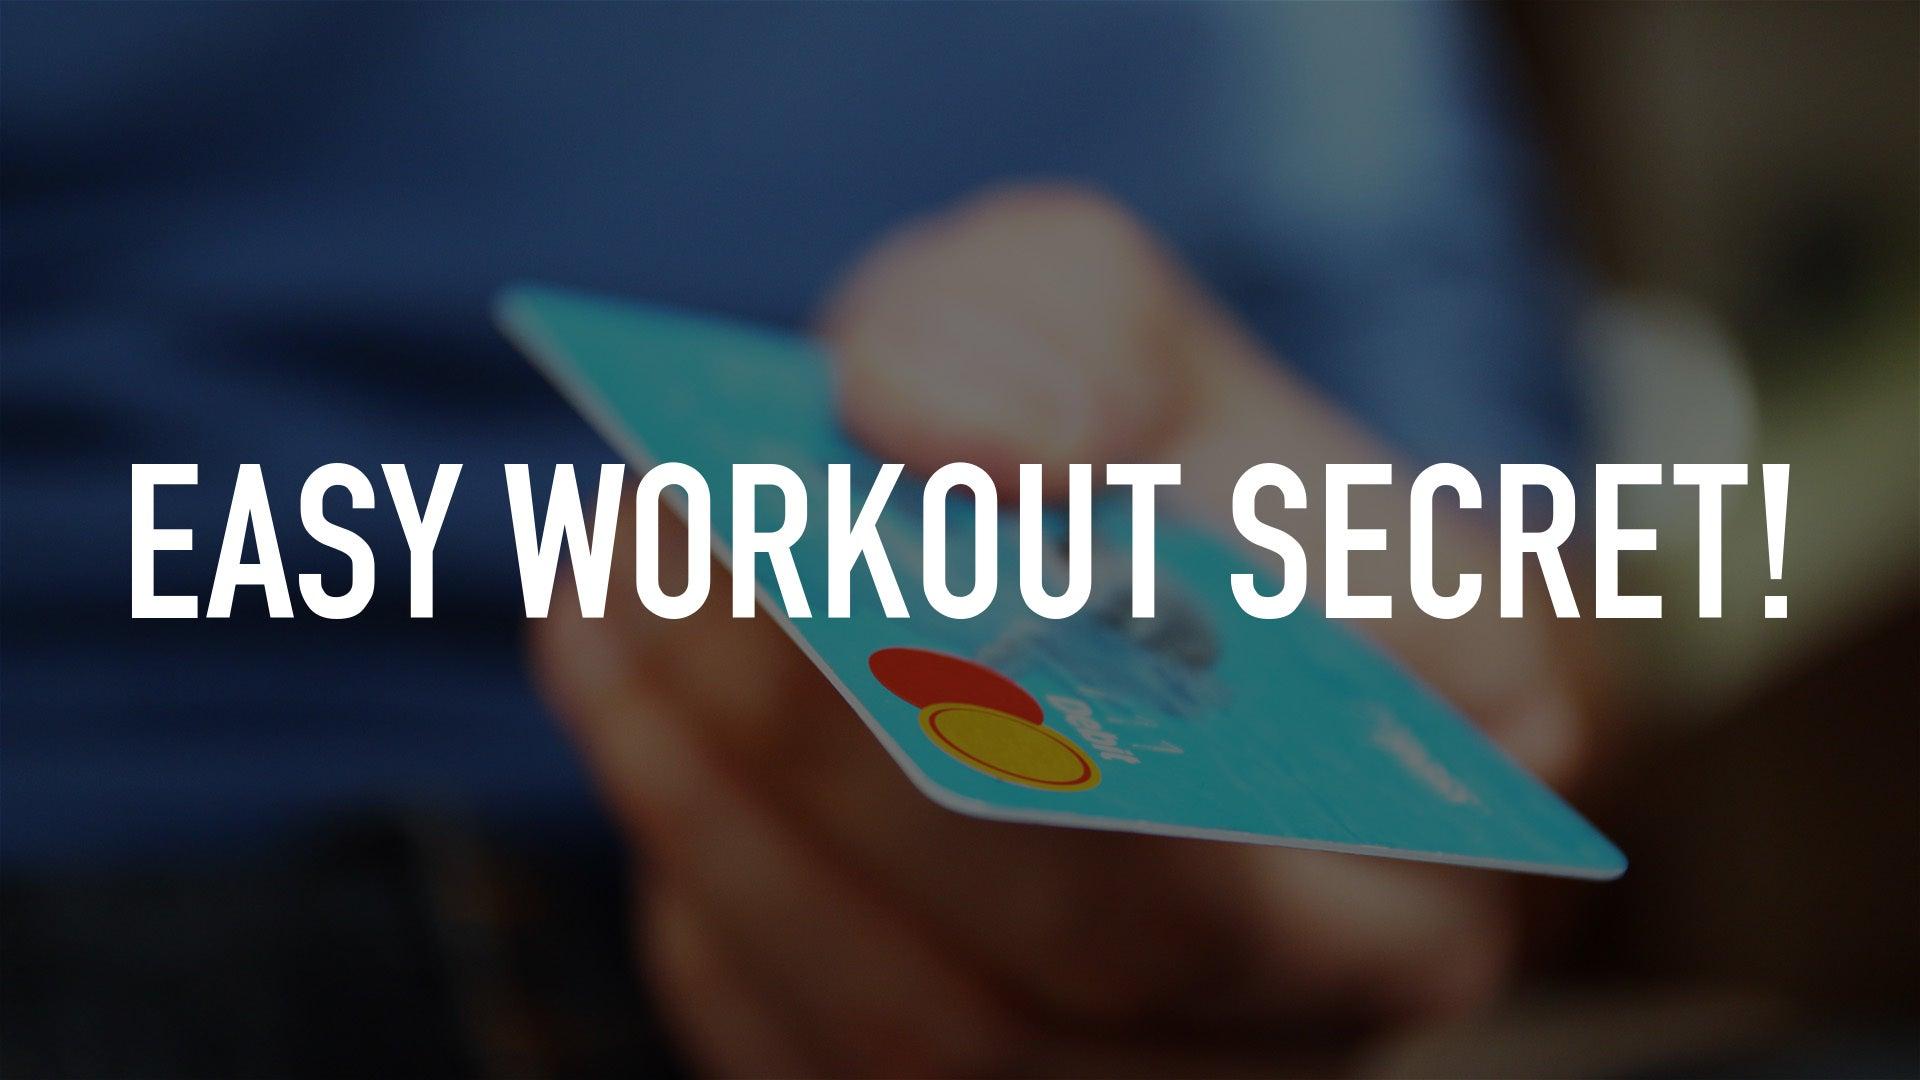 Easy Workout Secret!